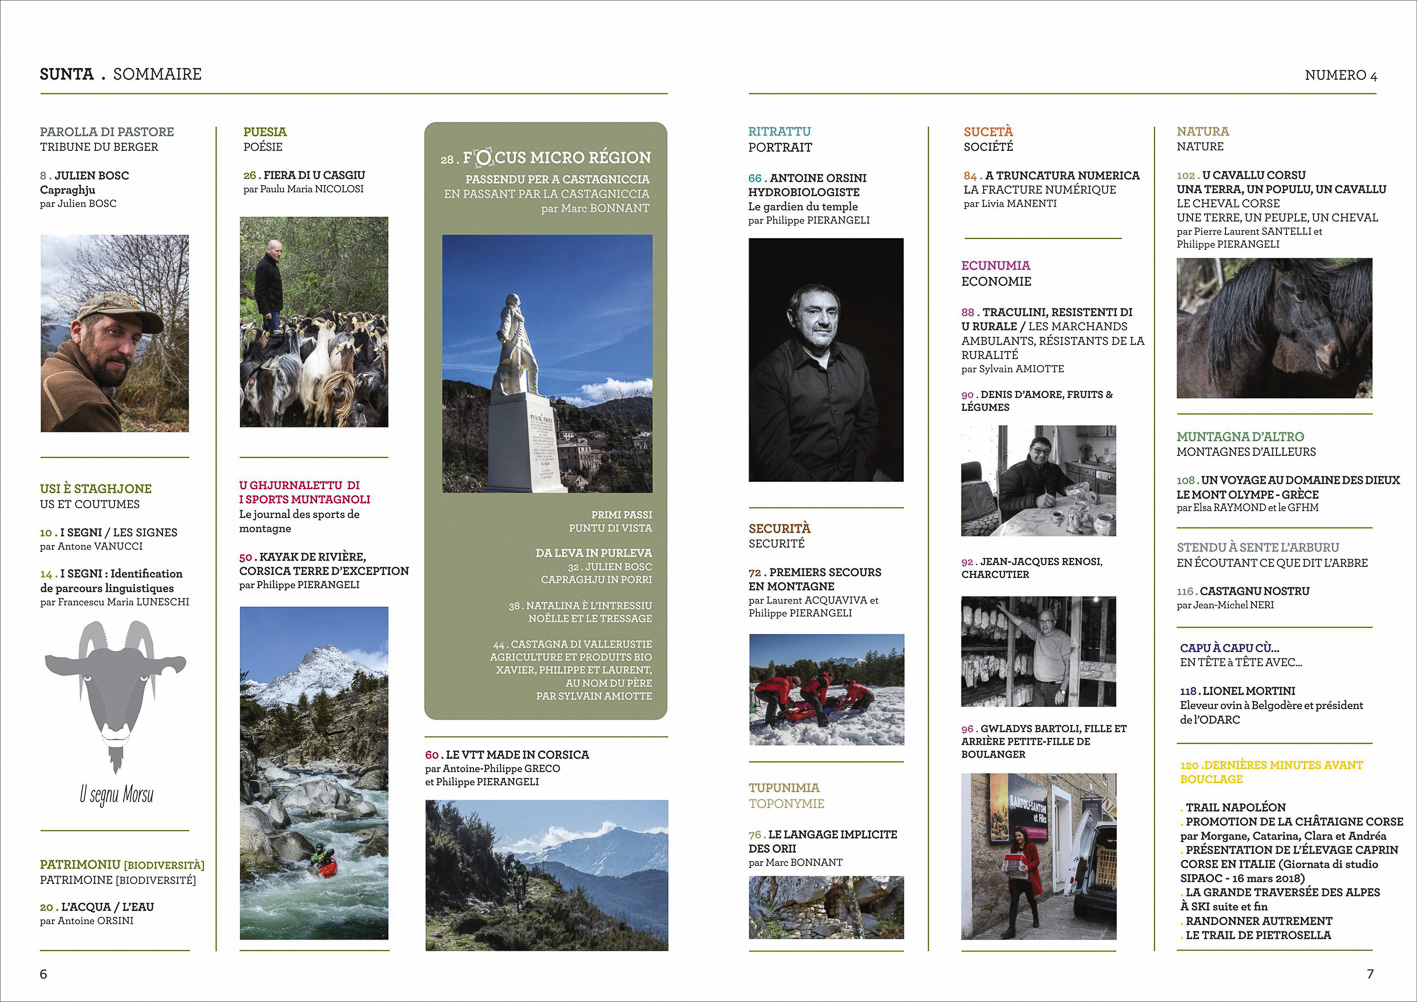 https://www.isulamuntagna.corsica/shop/Isula-Muntagna-numero-4_p7.html